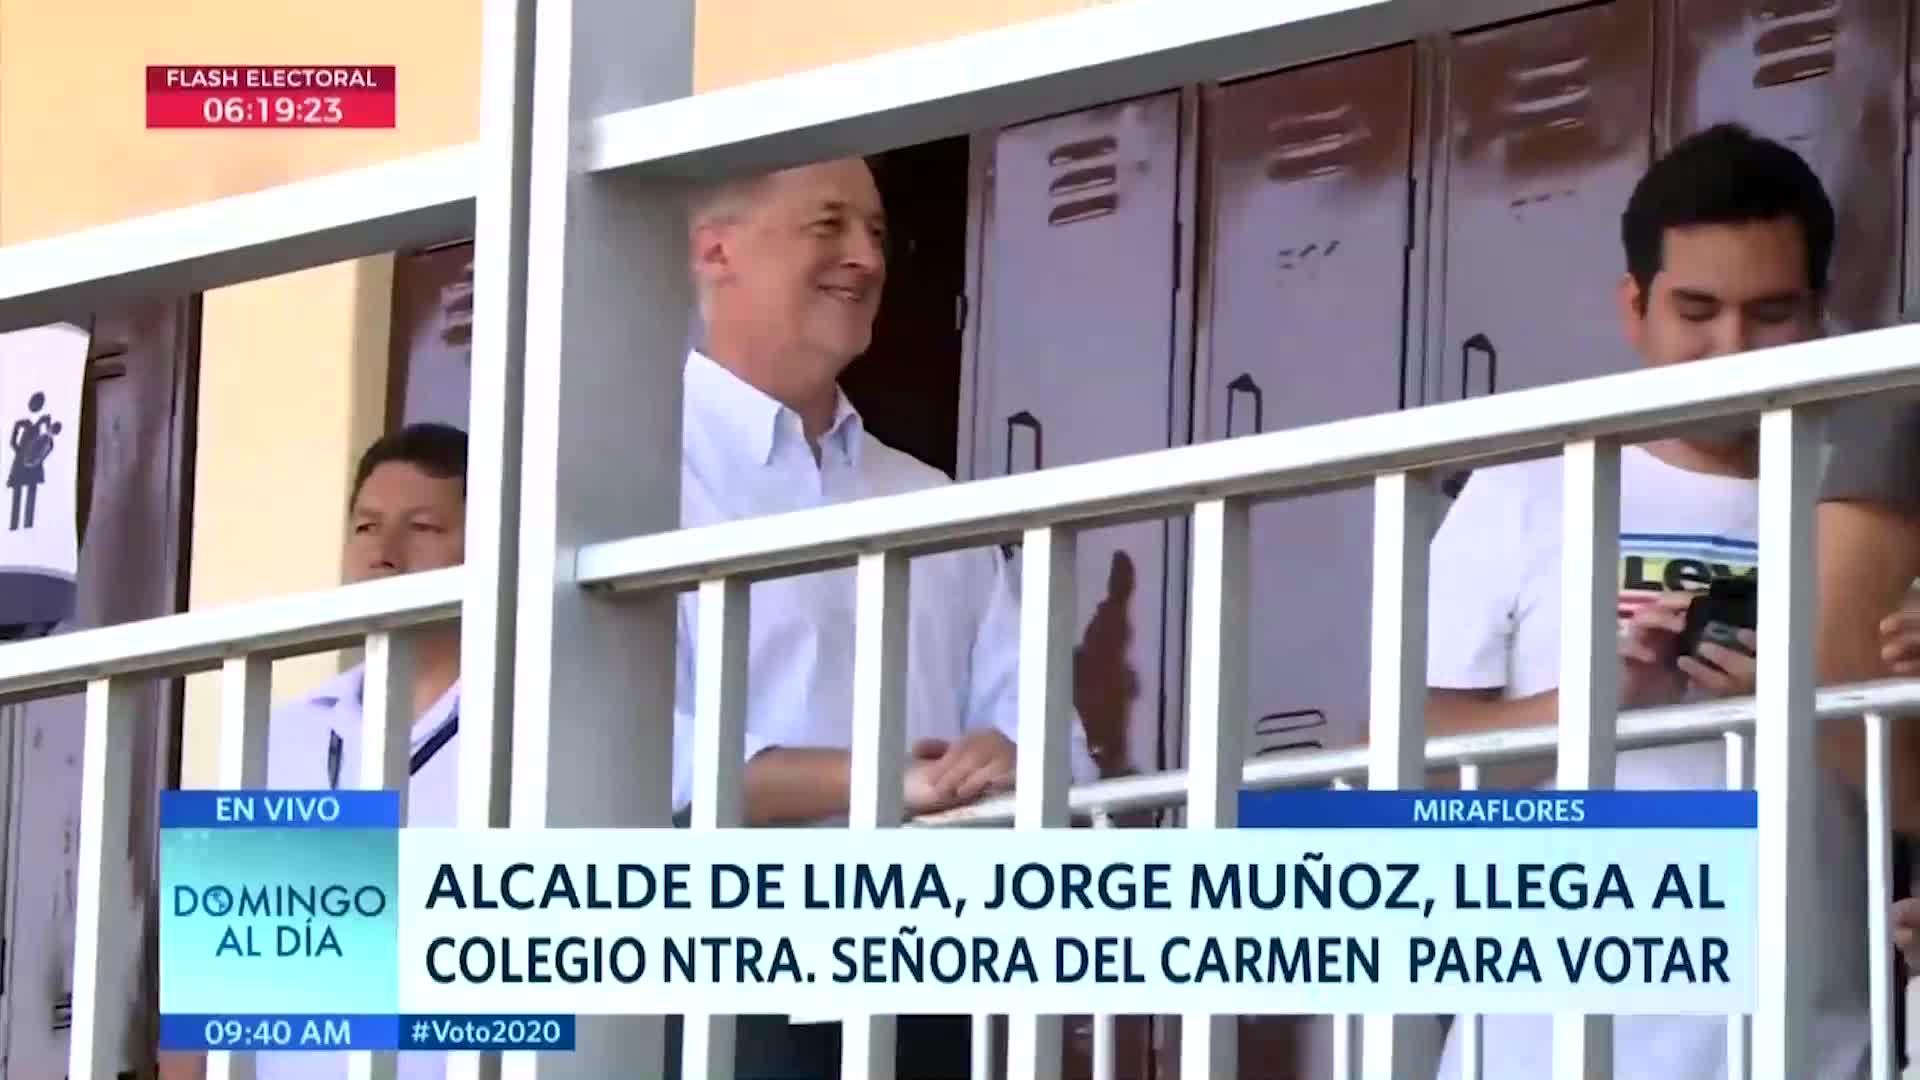 Elecciones 2020: Alcalde de Lima se ofreció a ser miembro de mesa